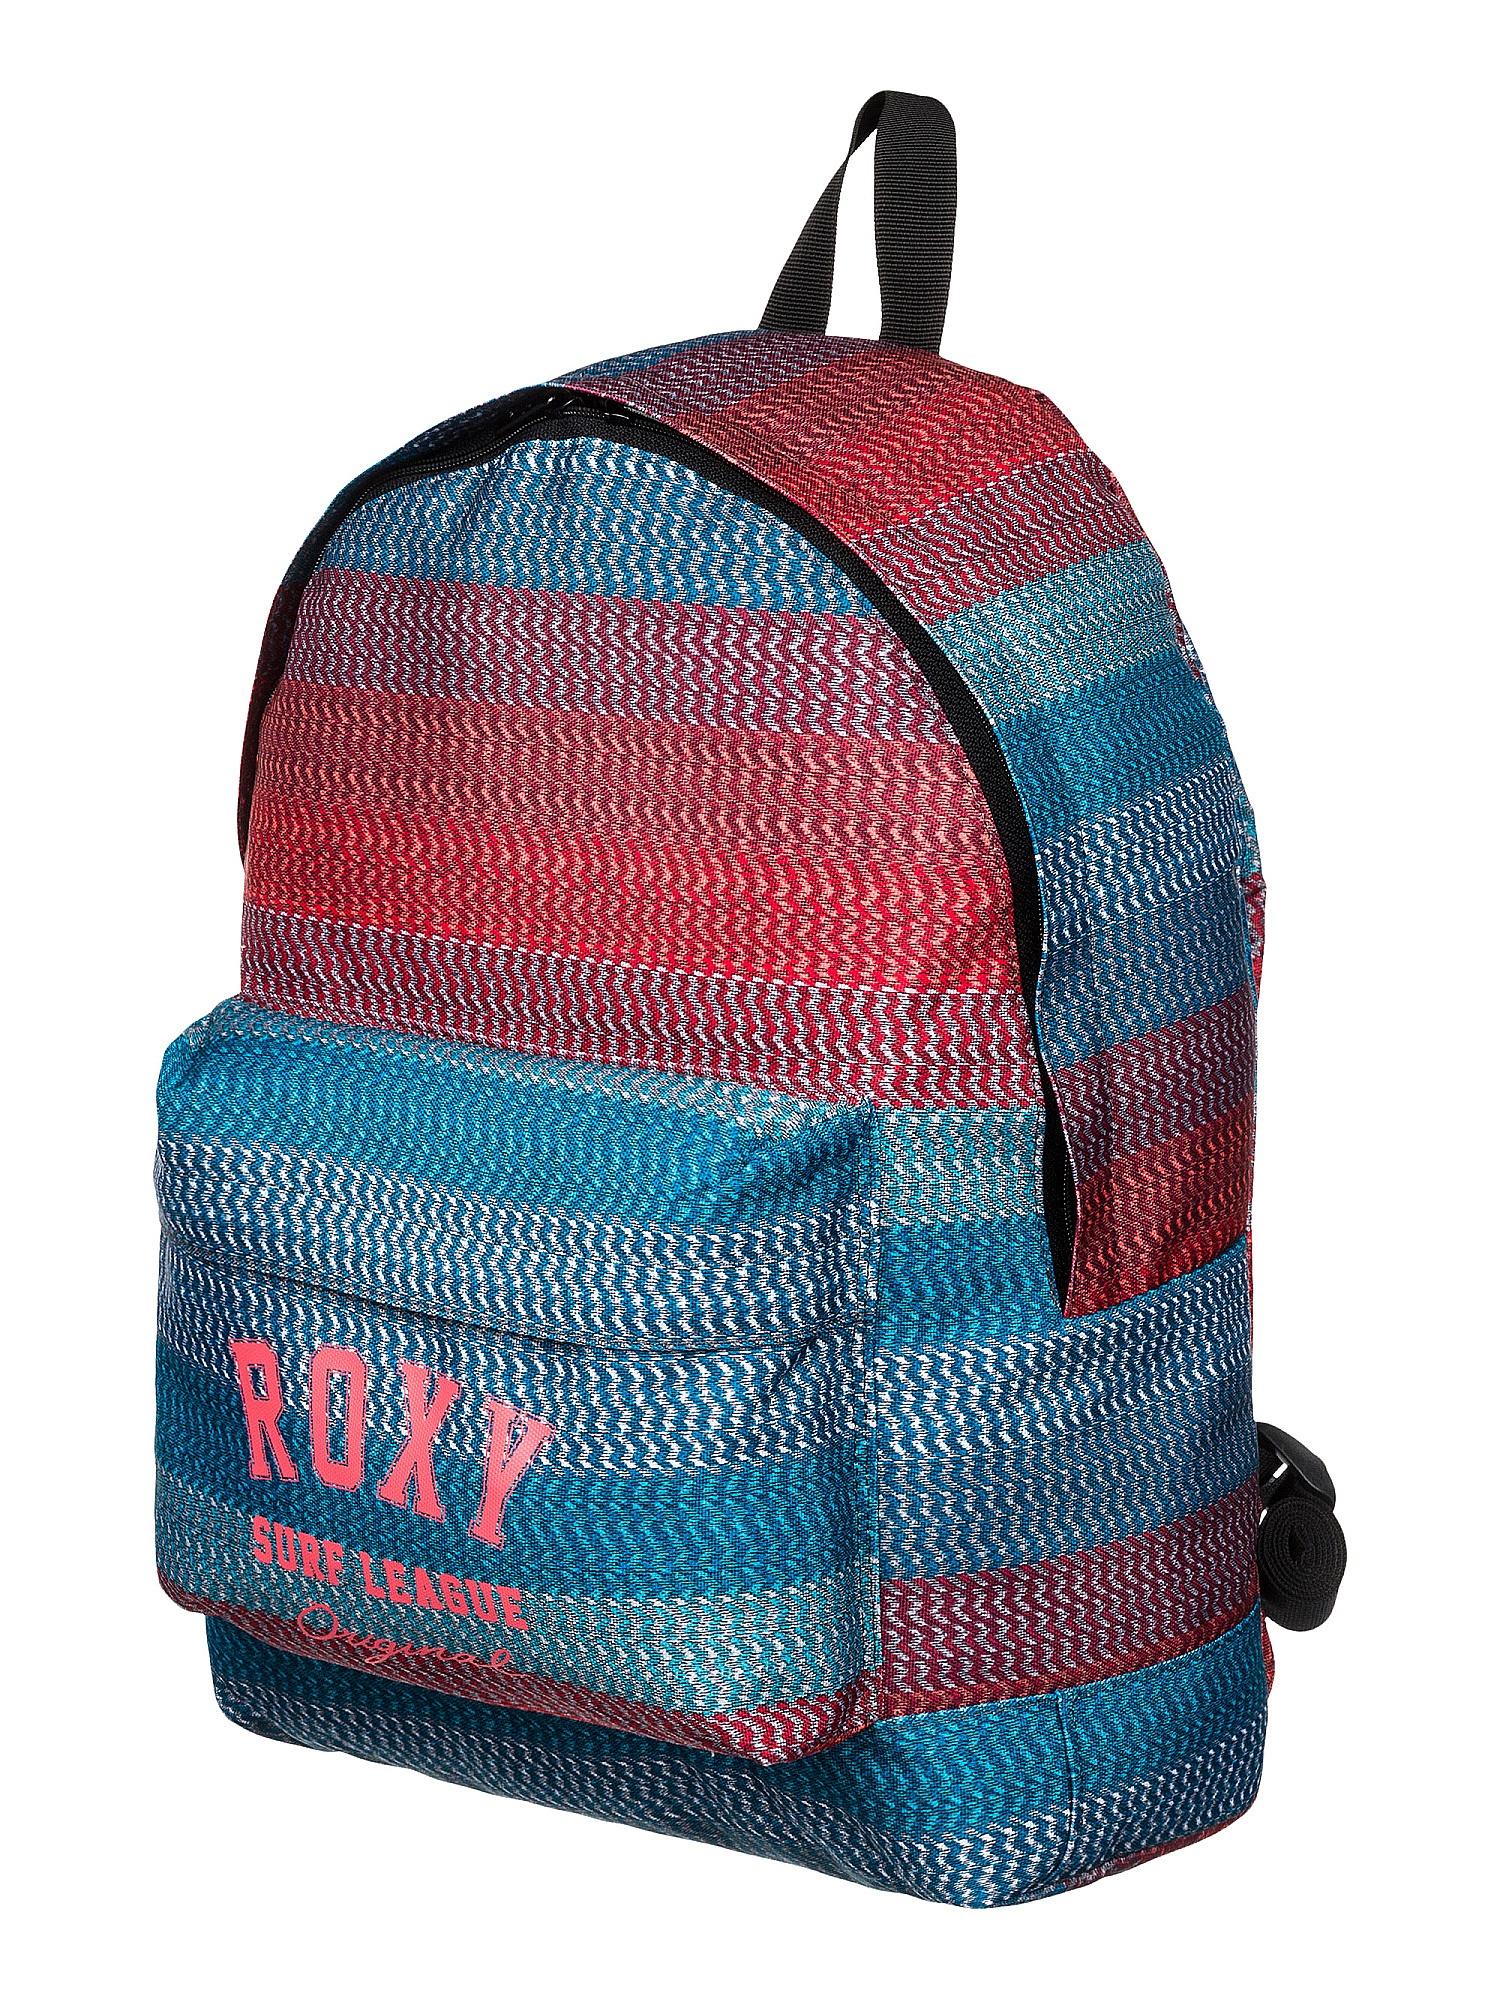 batoh Roxy Sugar Baby Girl - BRW6 Panama Zigzag Stripes Moroccan 16 L 94366cd2f3